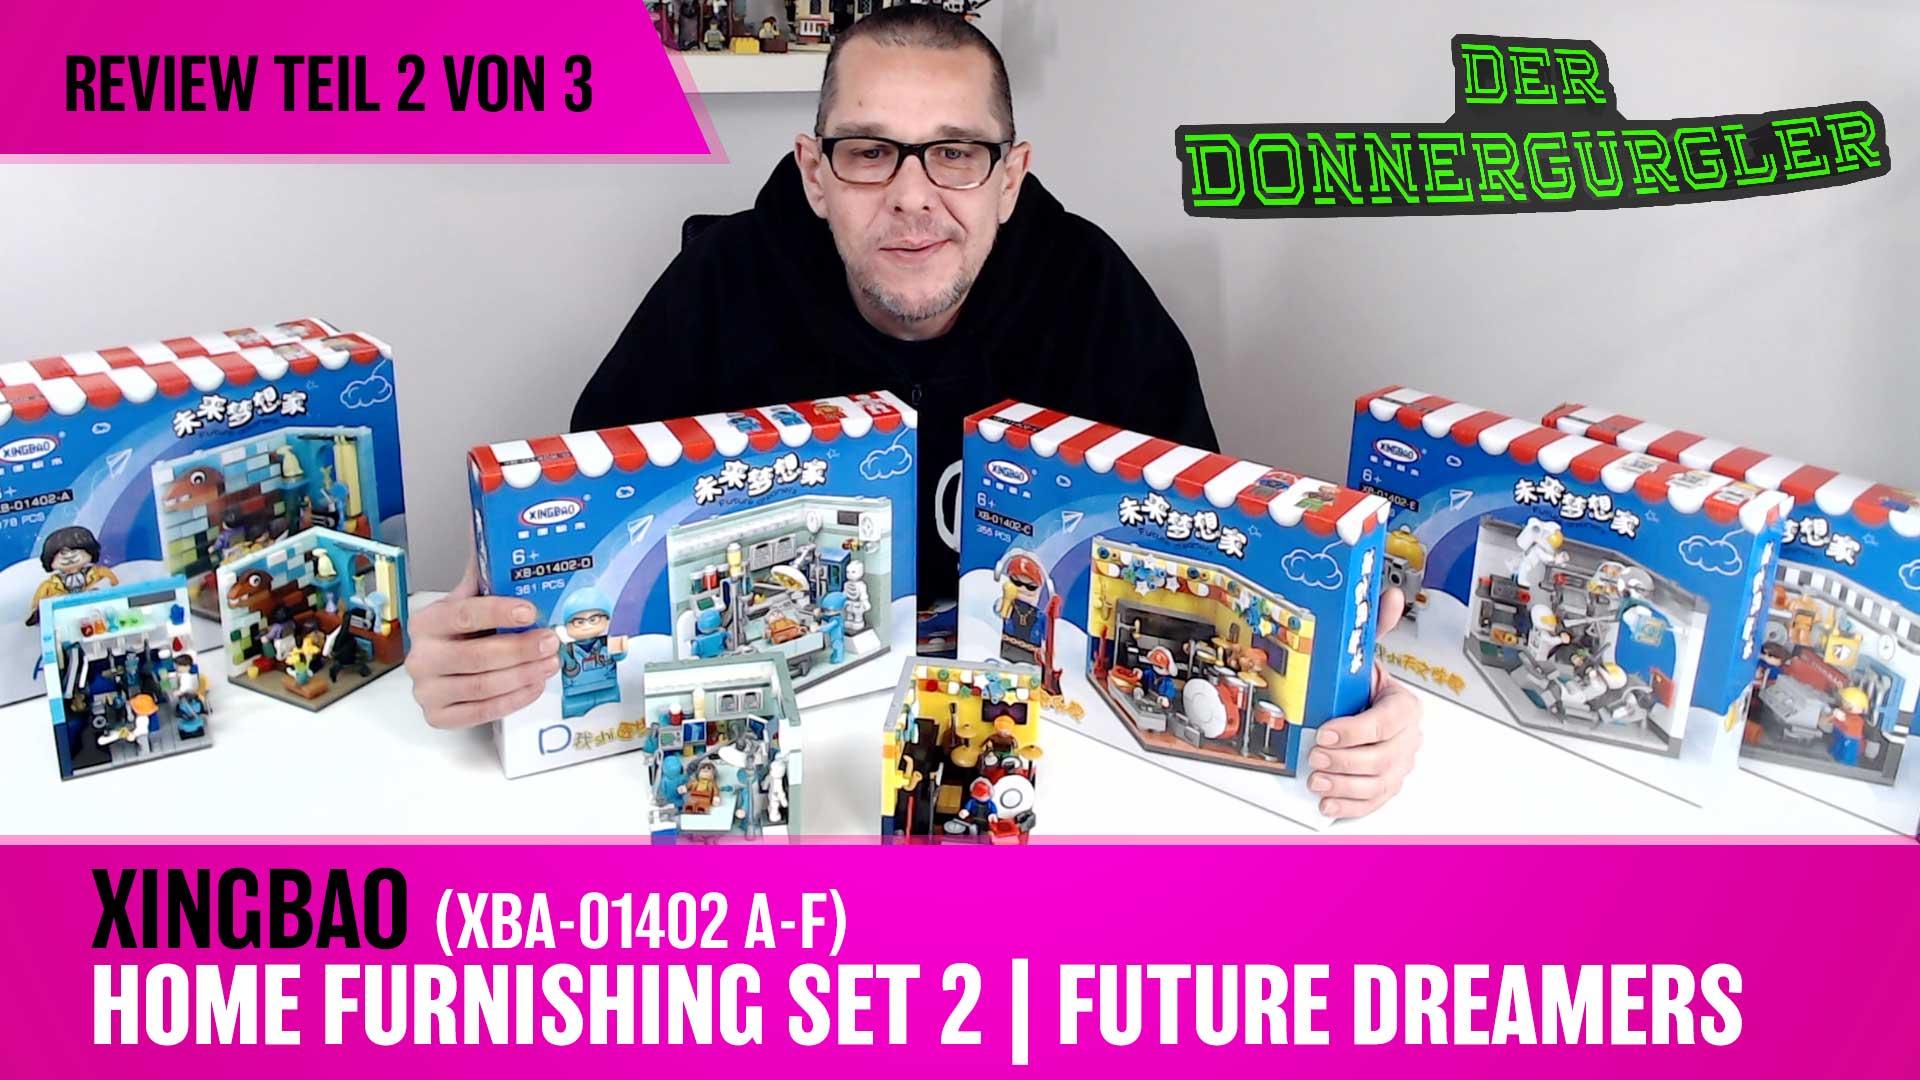 Xingbao Home Furnishing Set 2 - Future Dreamers Kompletset XBA-01402A-F Teil 2v3